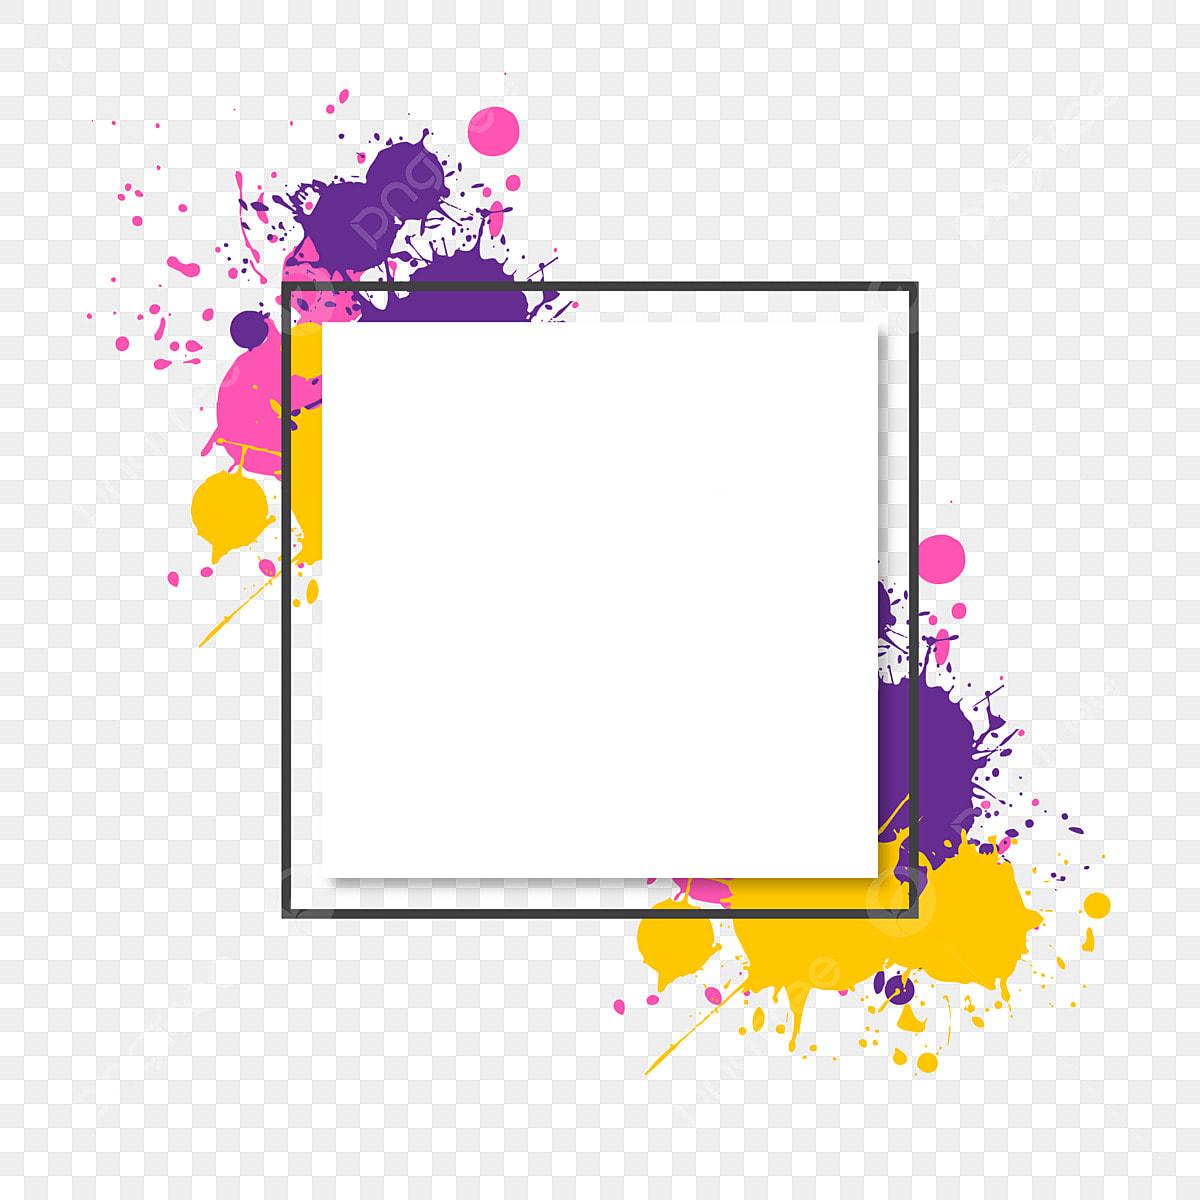 Vibrant Colorful Brush Splash Frame And Border, Brush